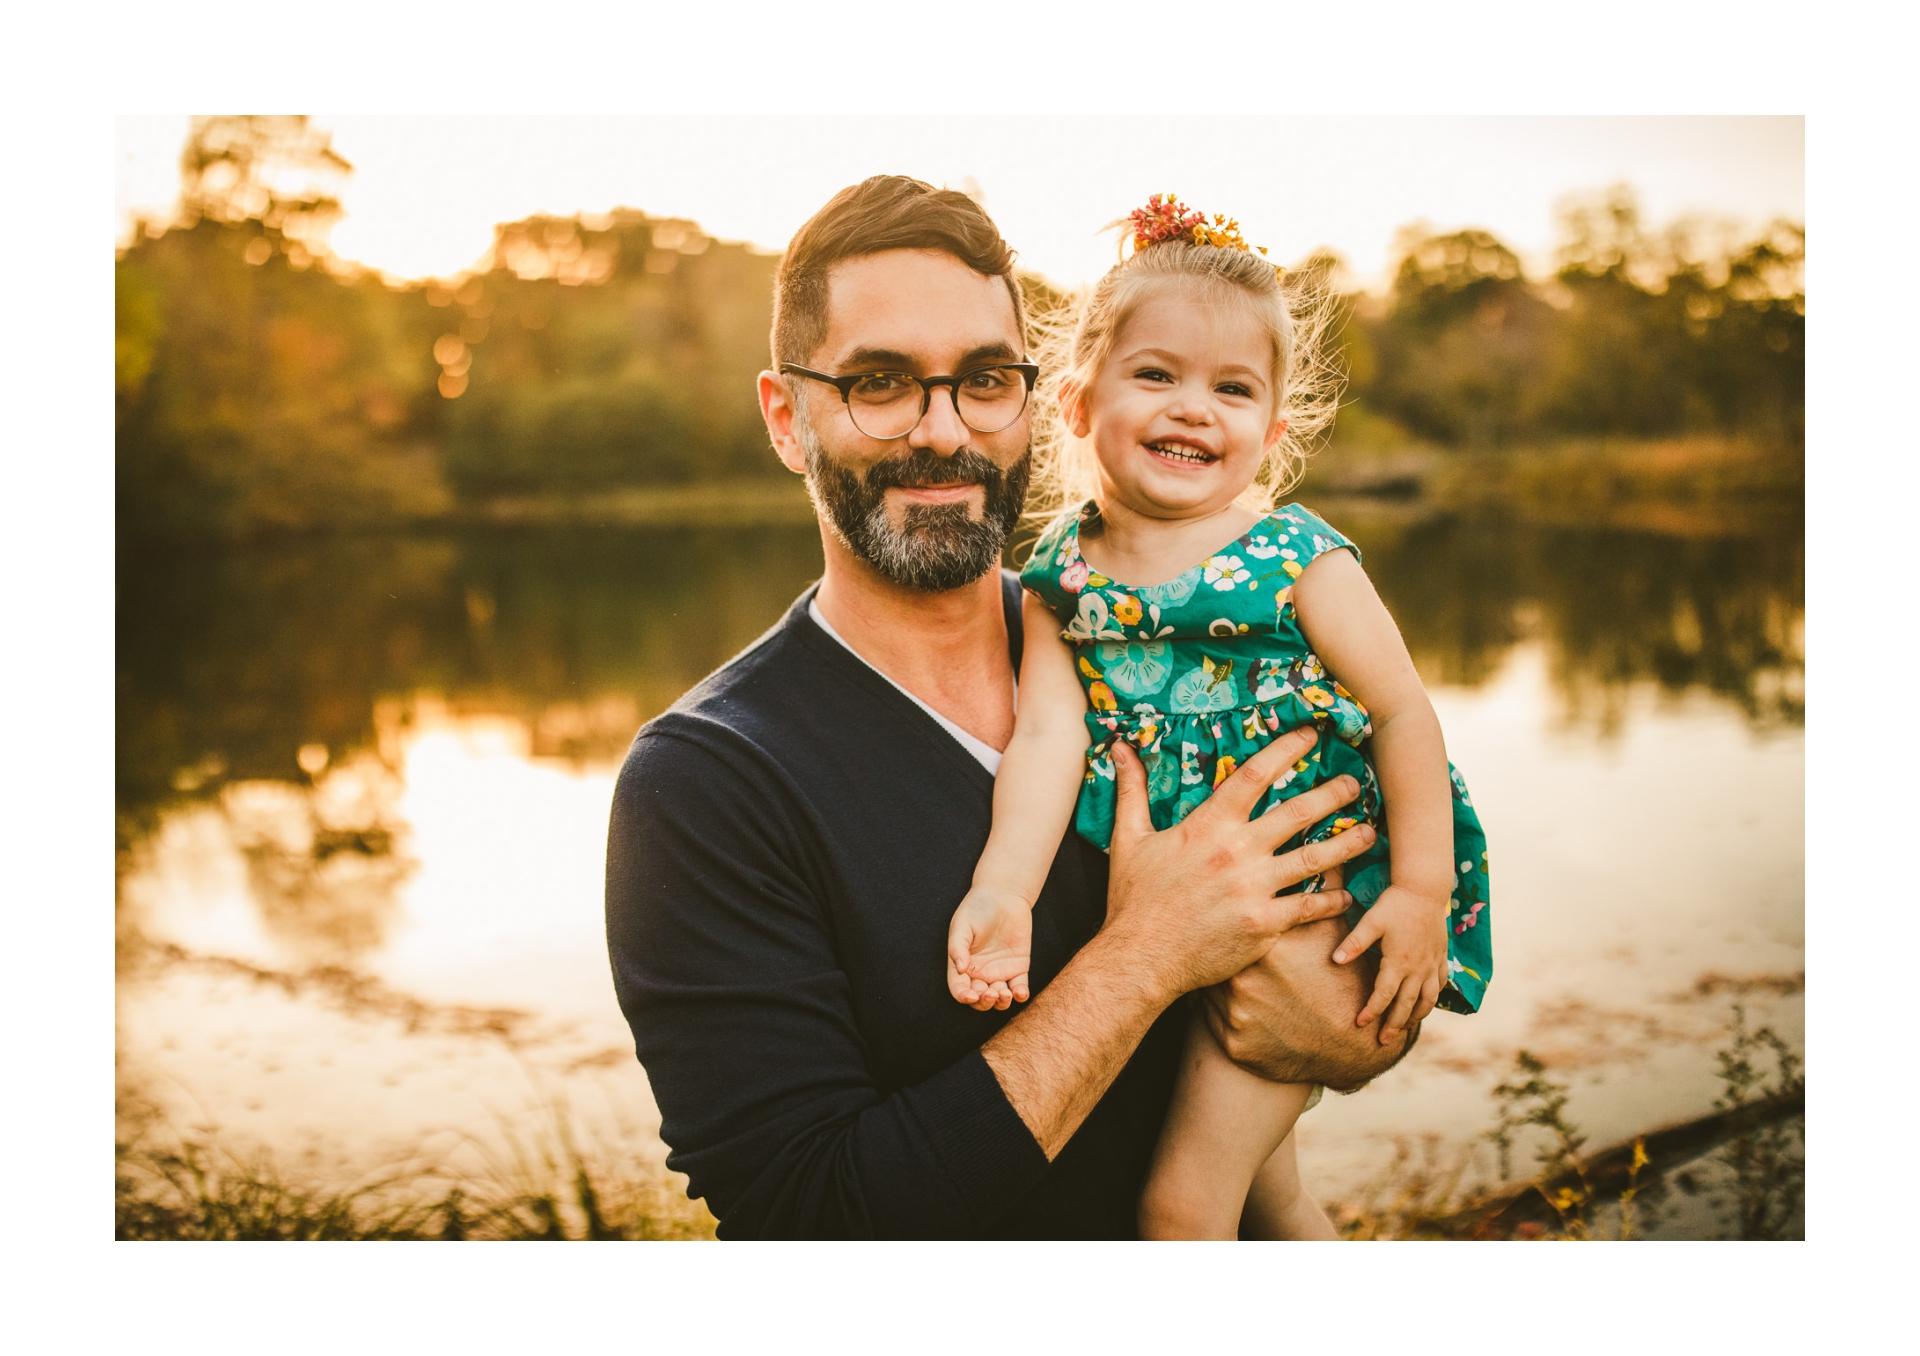 Lakewood Family Fall Portrait Photographer 24.jpg